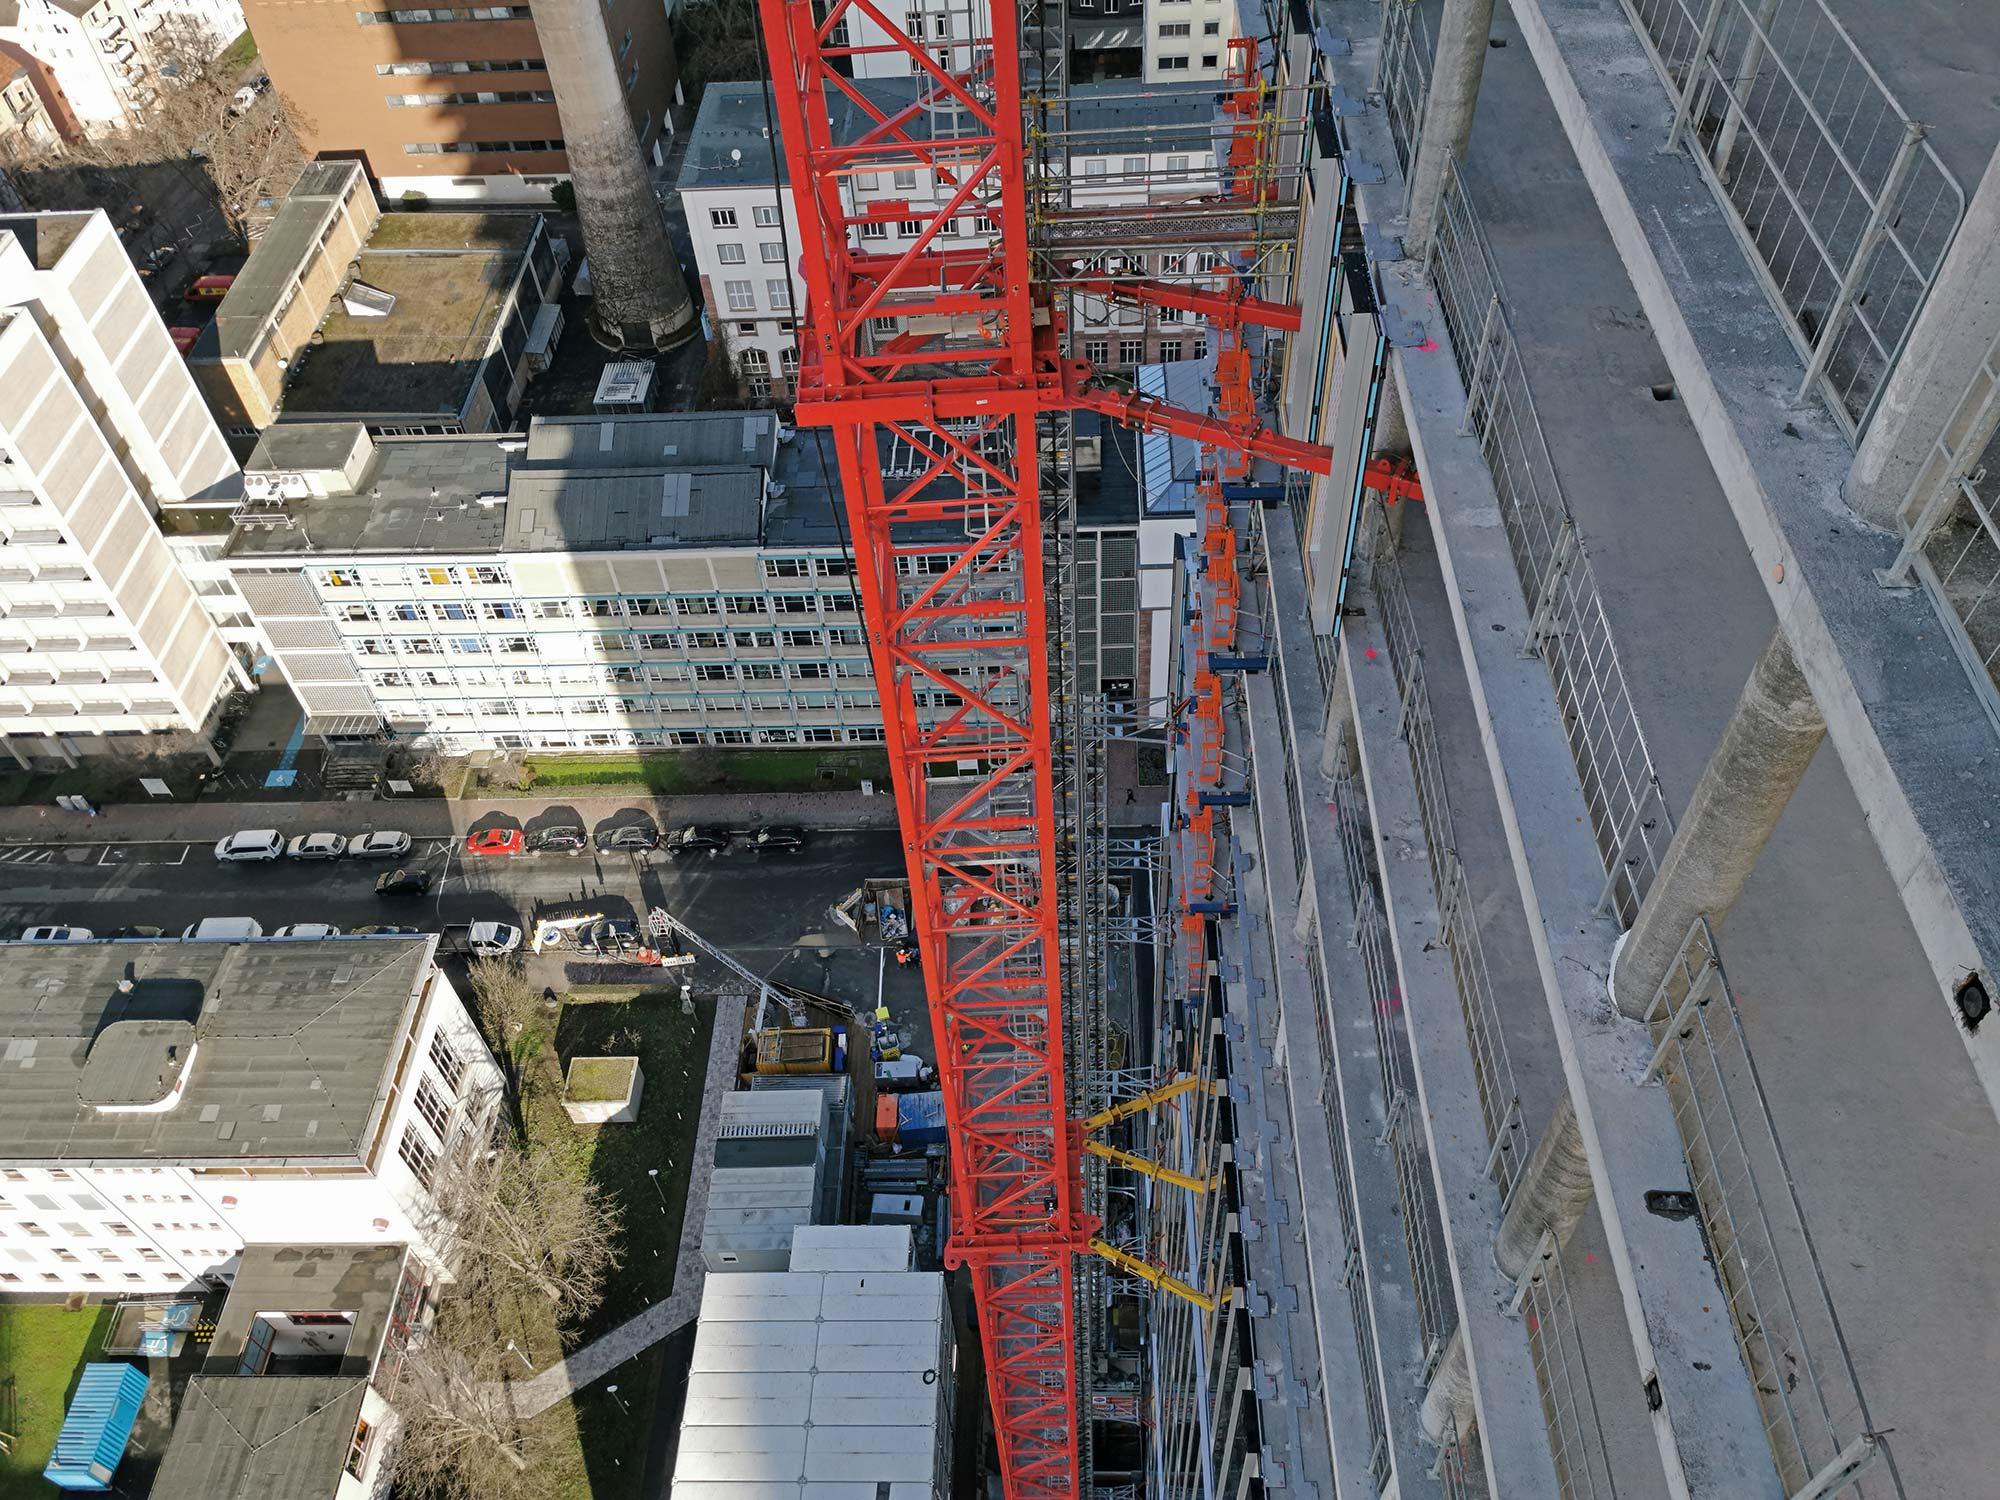 Hochhauskran - Lupp Baufirma - Hochhaus Baustelle Frankfurt - Rohbau